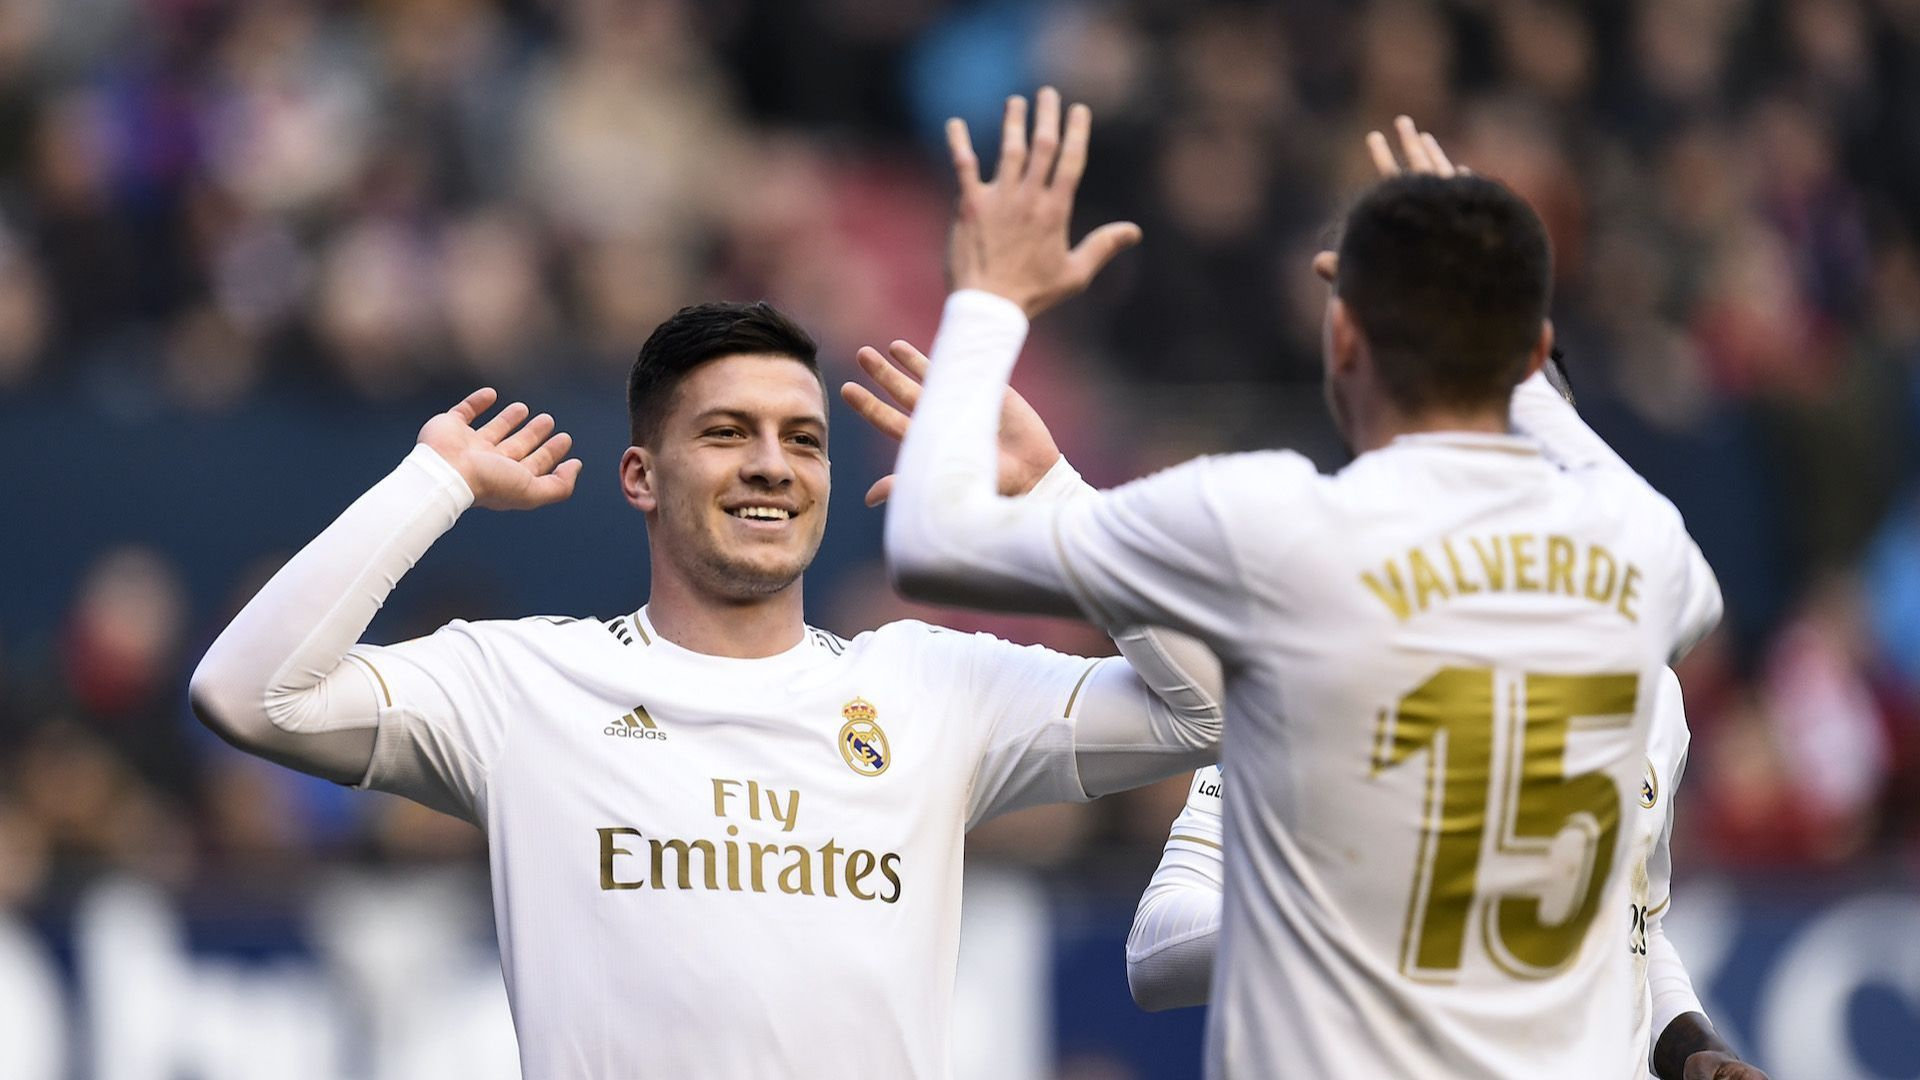 Три години затвор грозят нападател на Реал